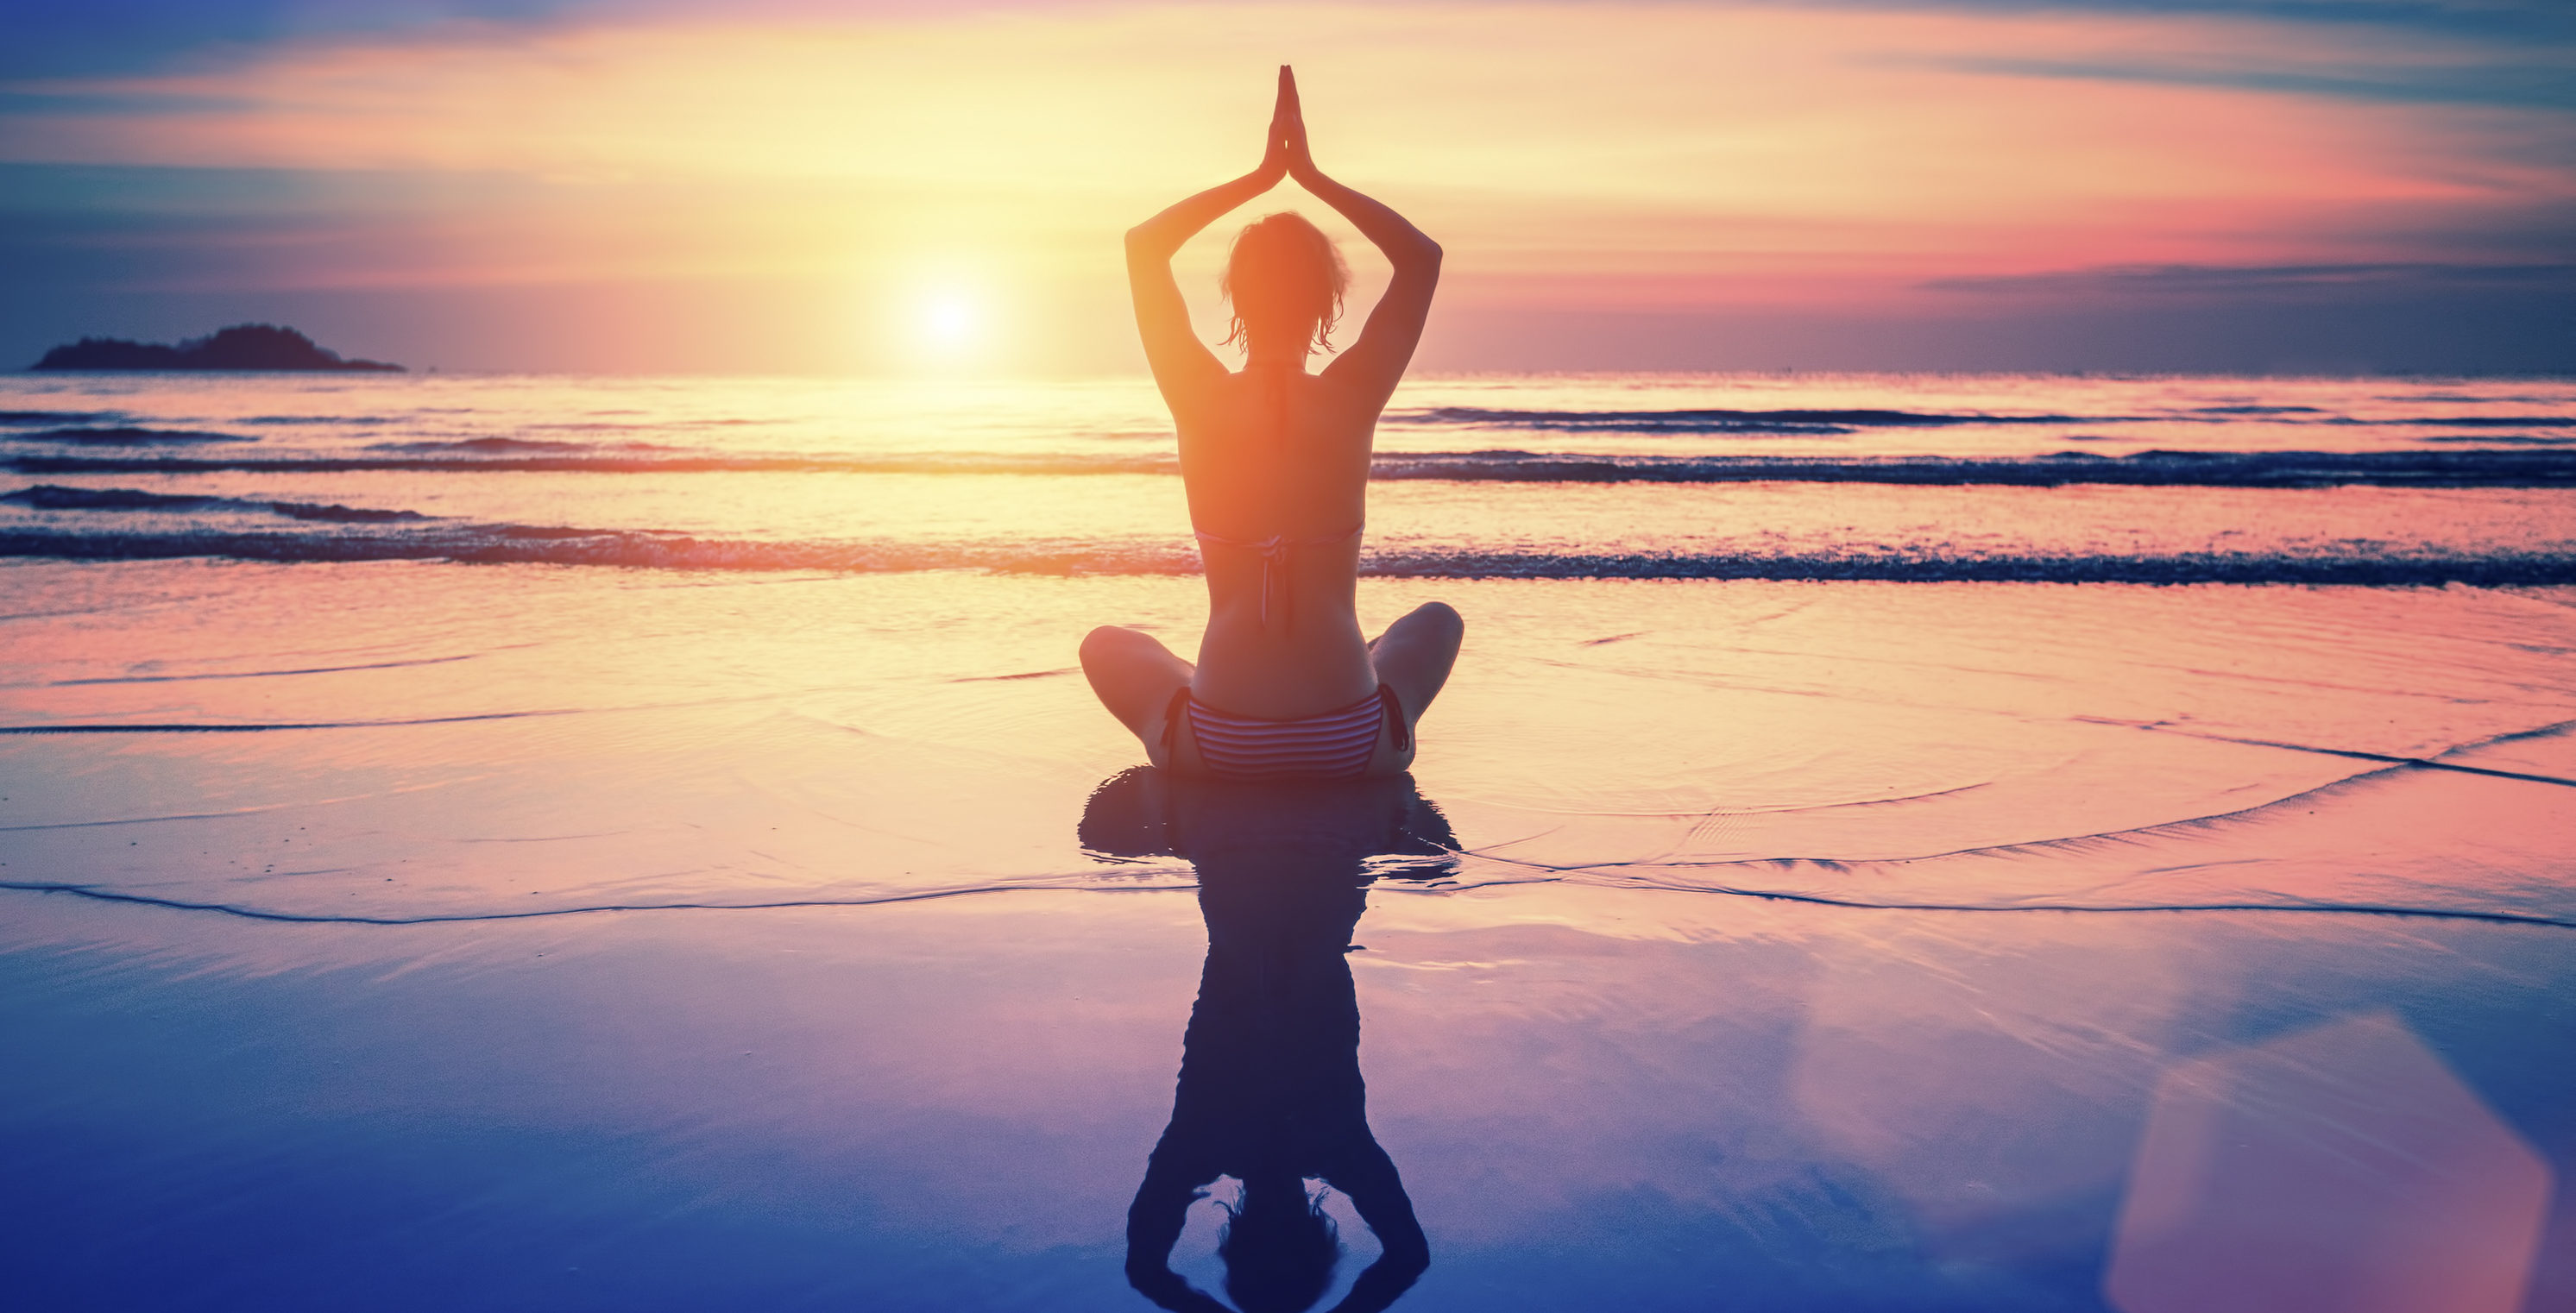 original yoga painting omwoman yoga meditate. THE BREATH-ANXIETY CONVERSATION Original Yoga Painting Omwoman Meditate